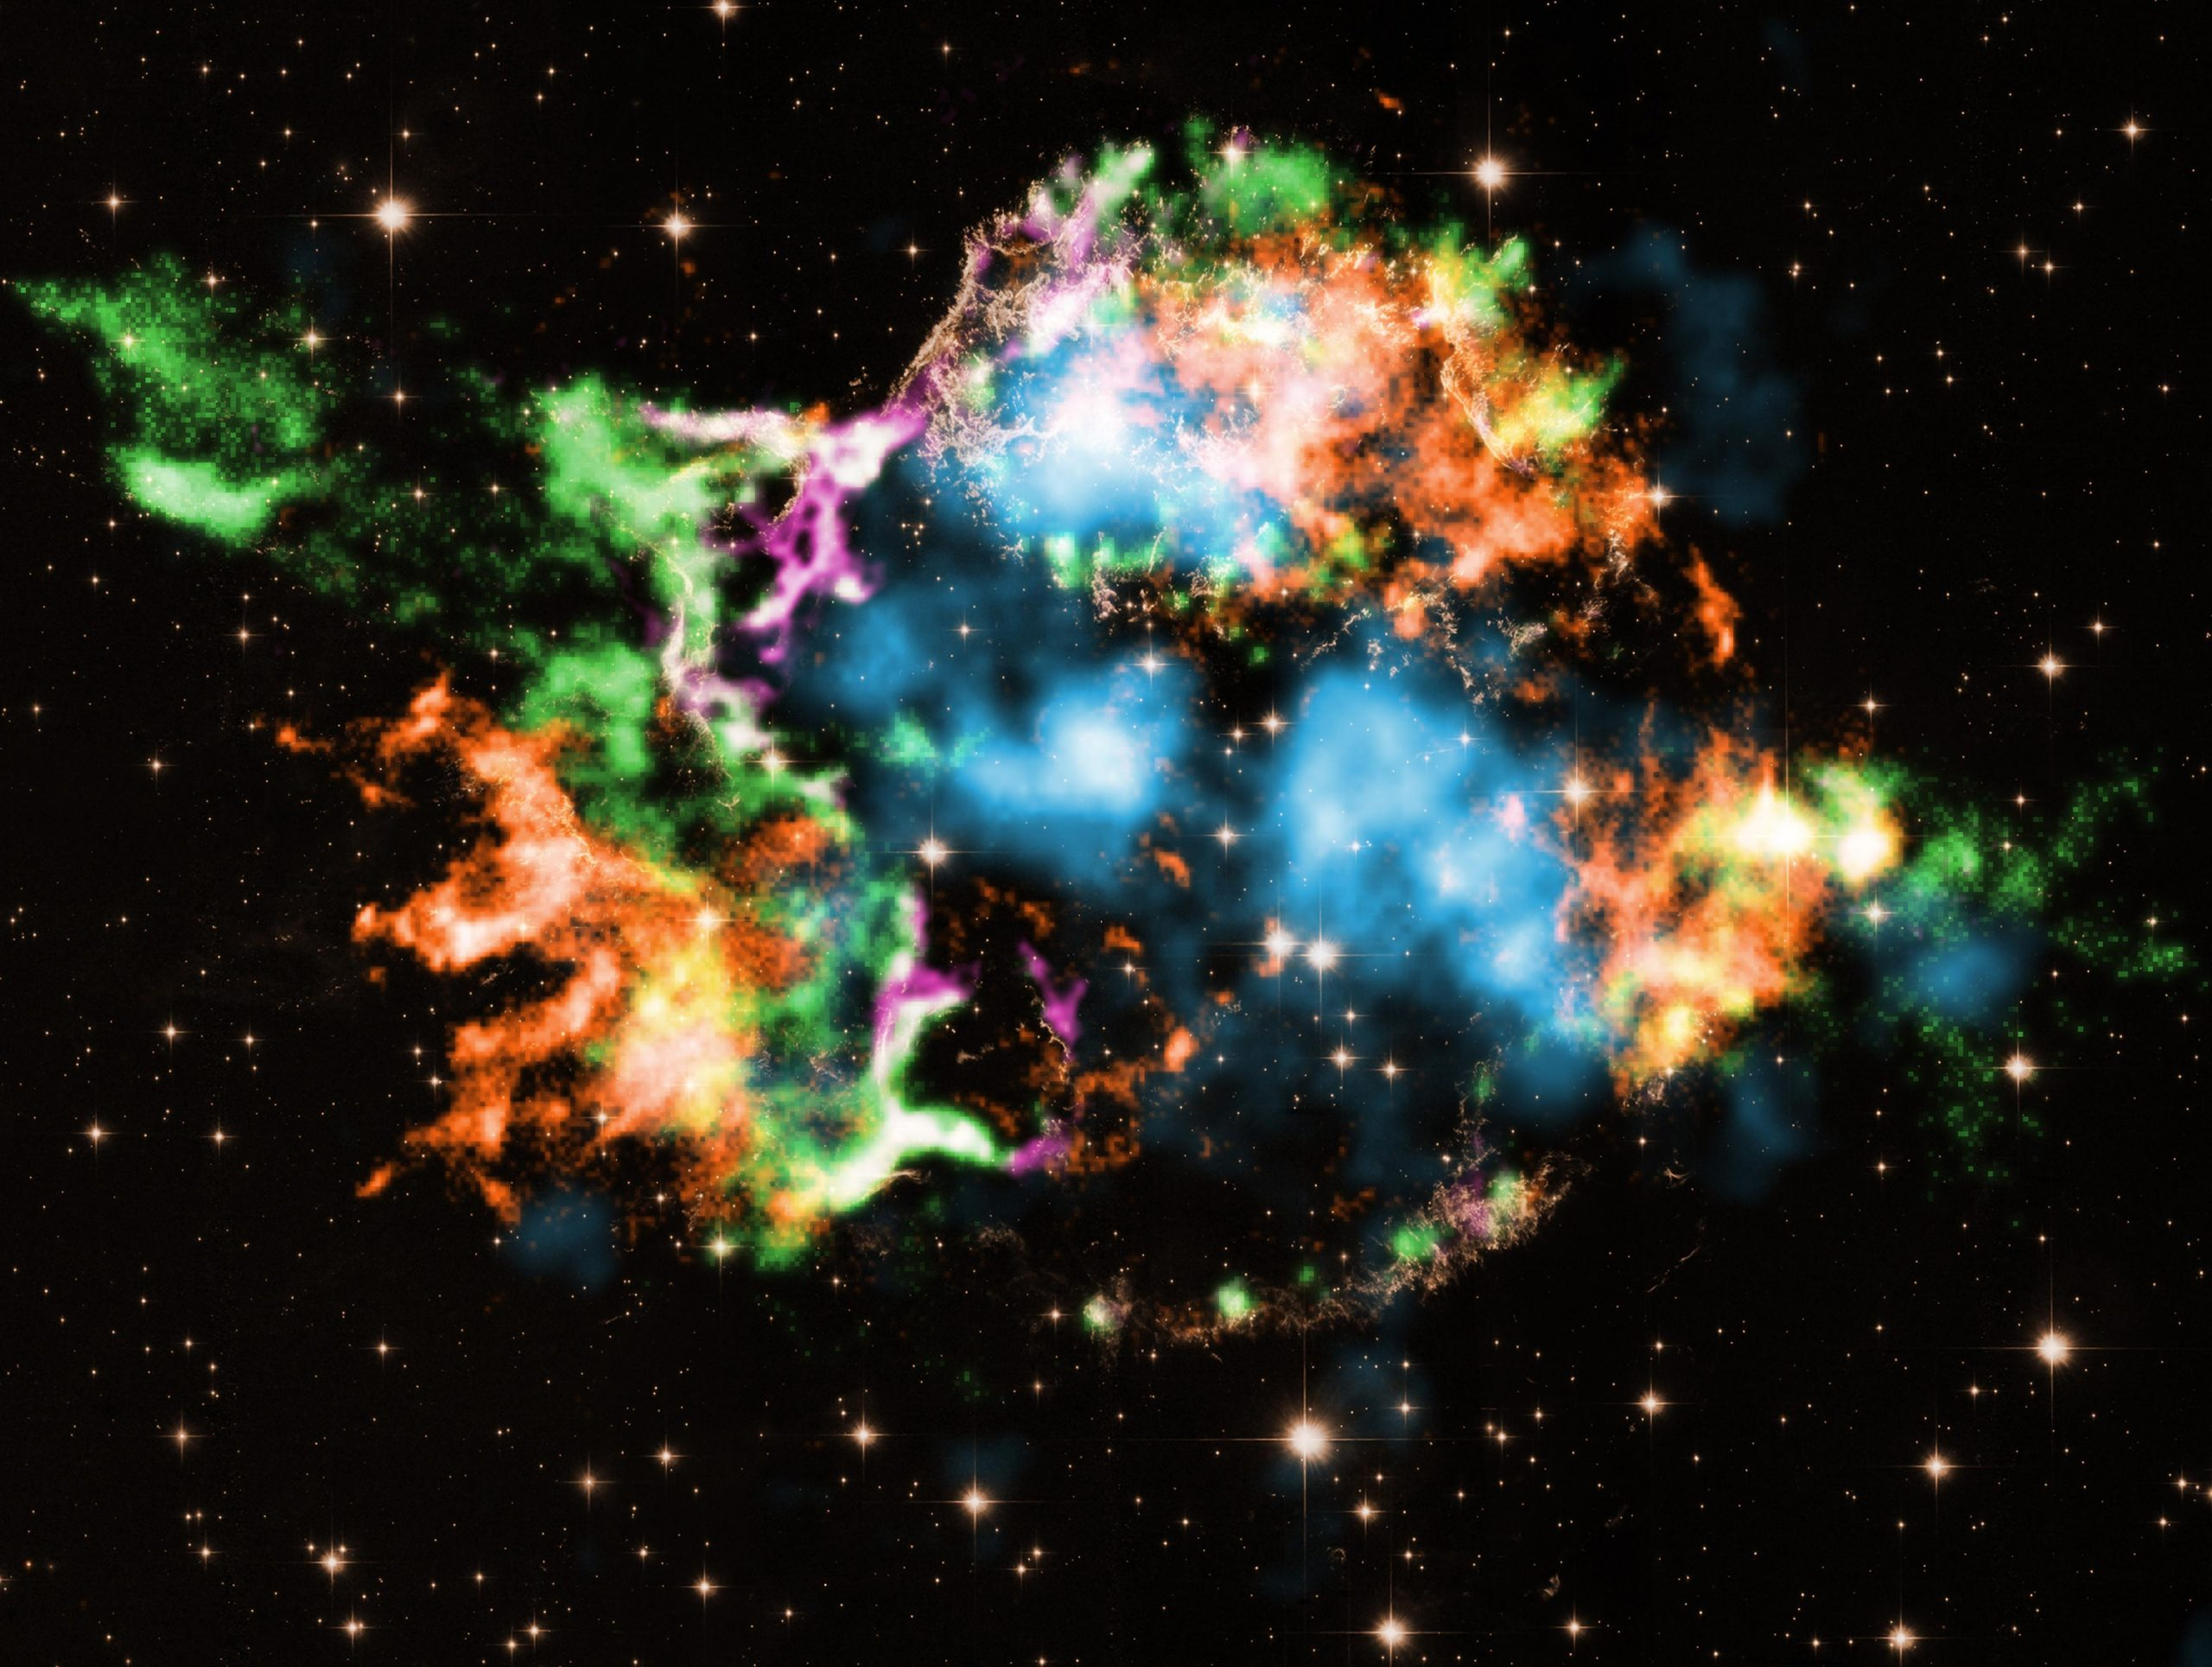 UH Leads International Star Study Using NASA's New $10 Billion Space Telescope